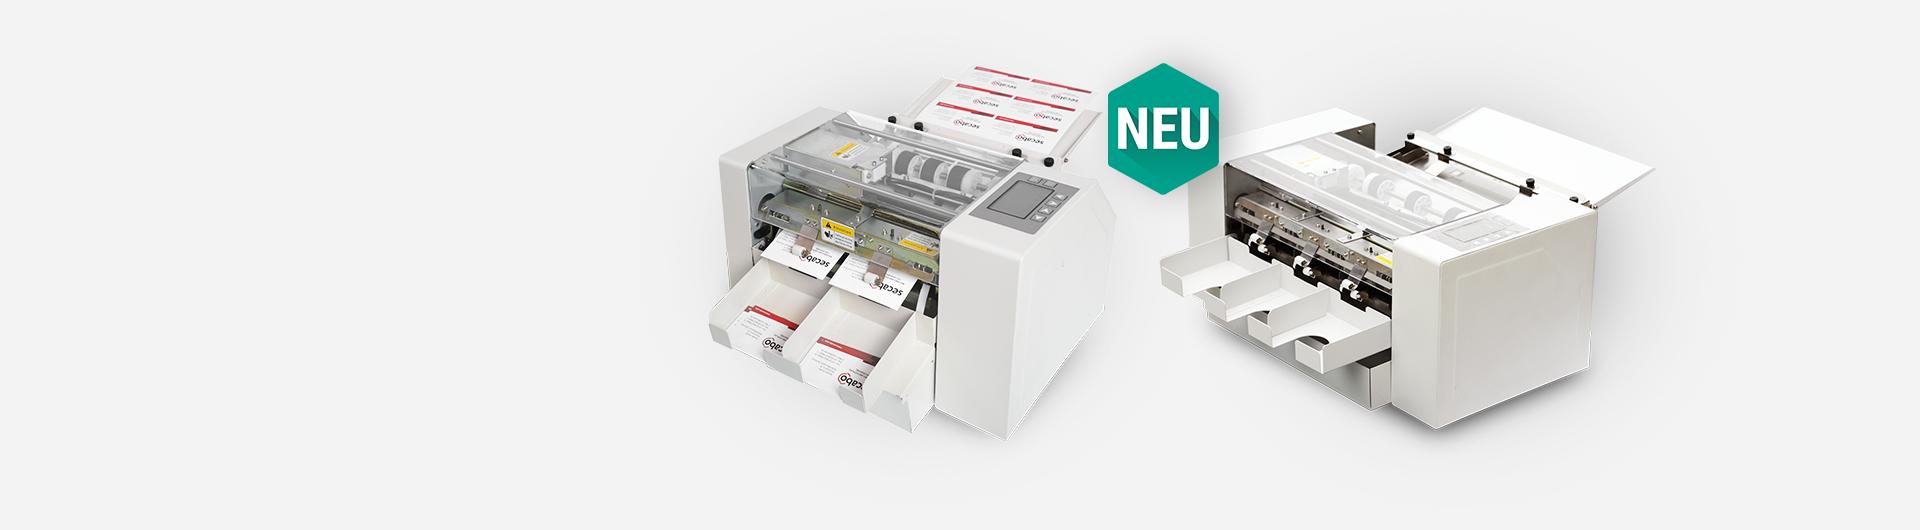 Secabos Card Cutter CC21 (DIN A4) & CC30 (DIN A3)